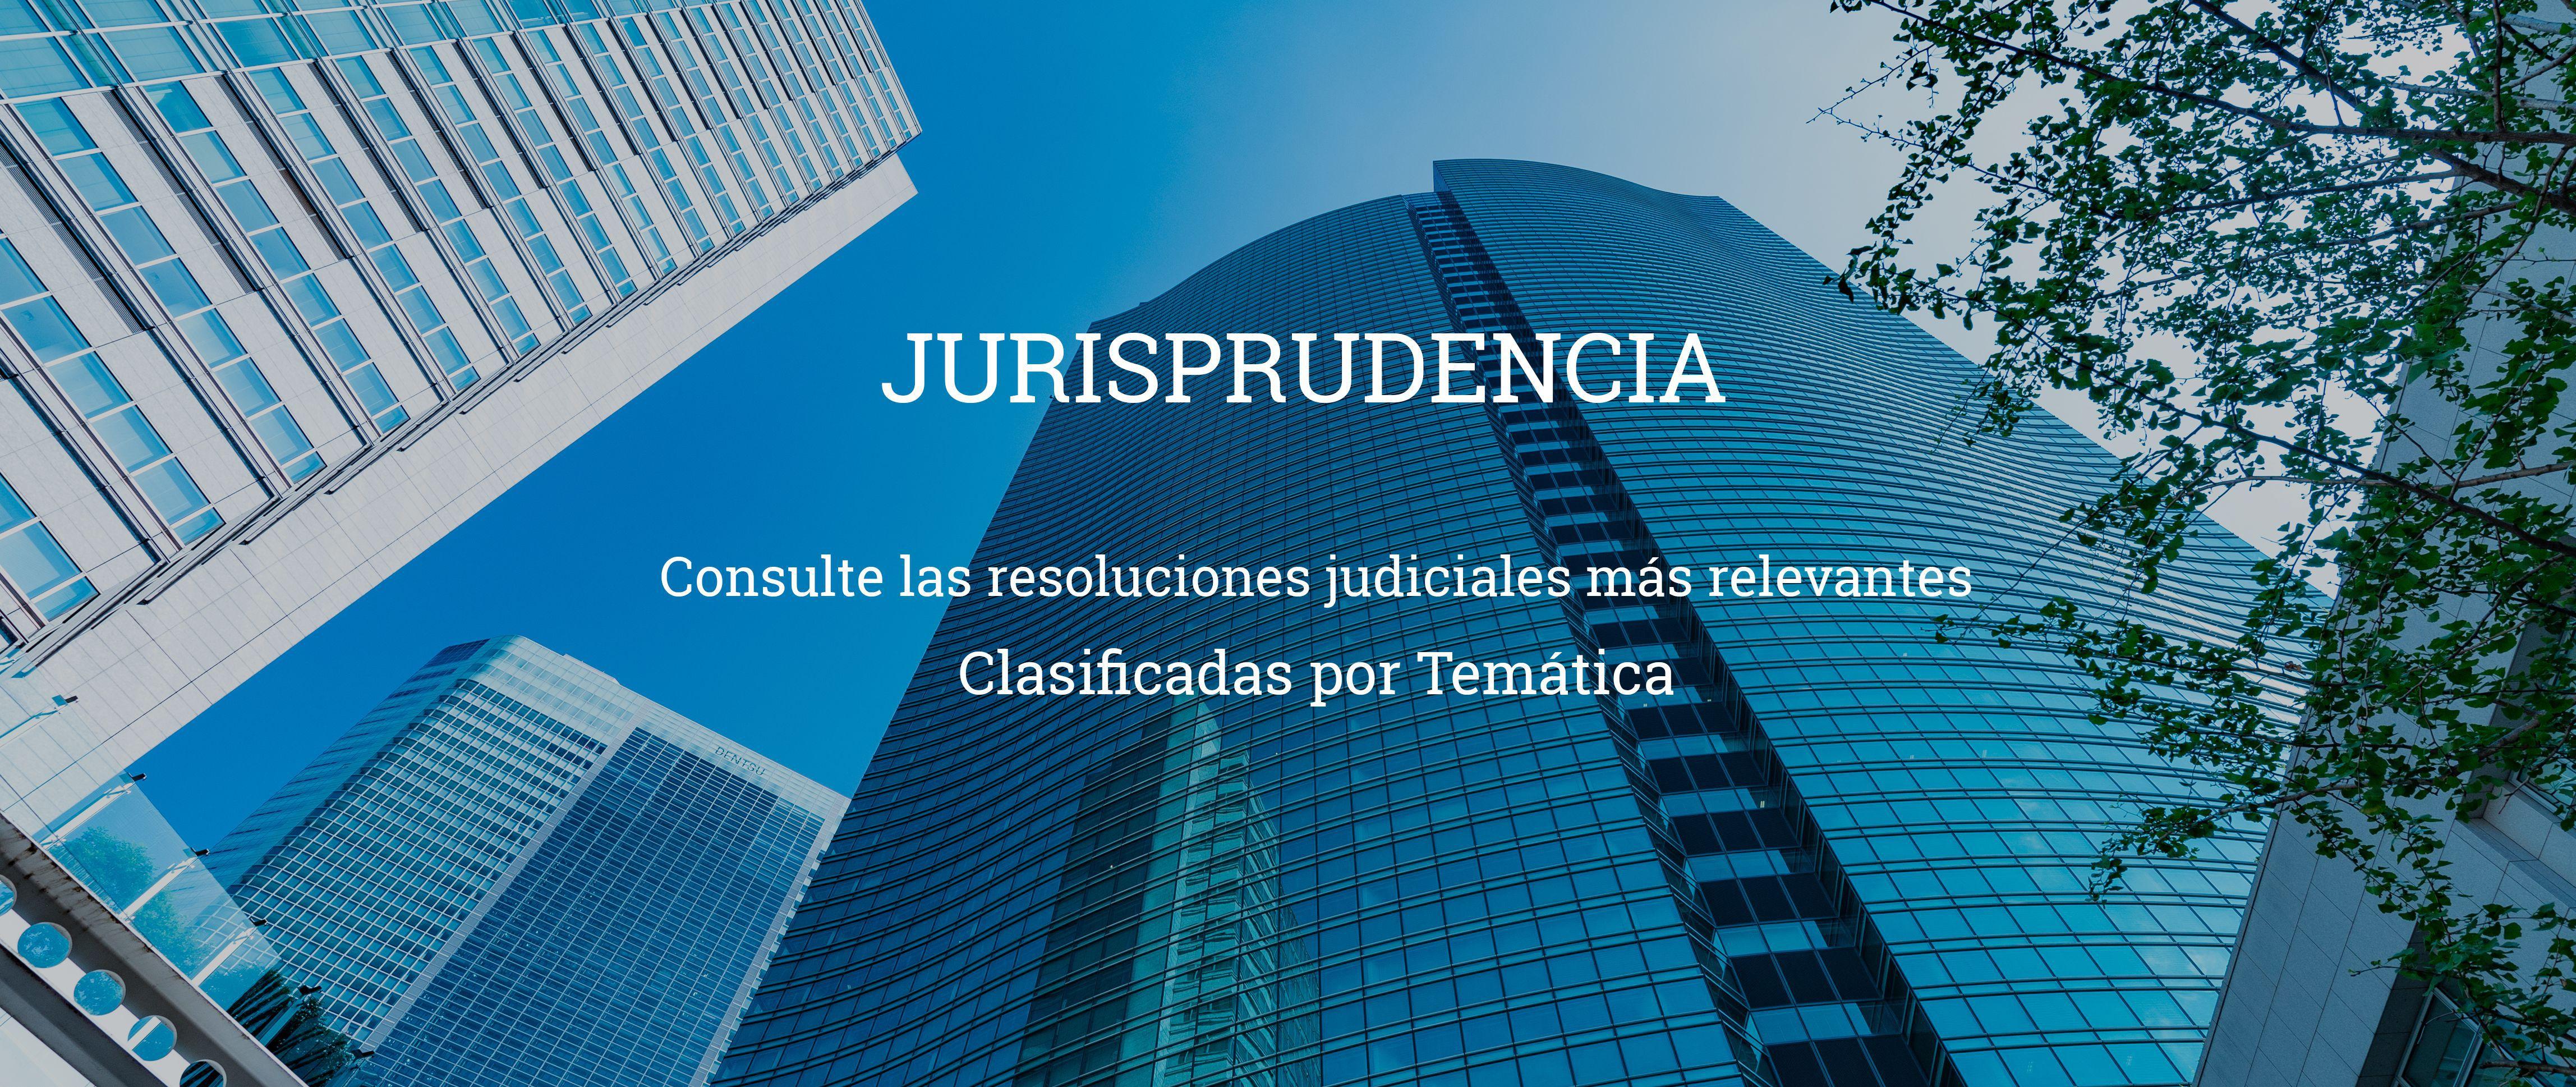 jurisprudencia por tematica Por Temática